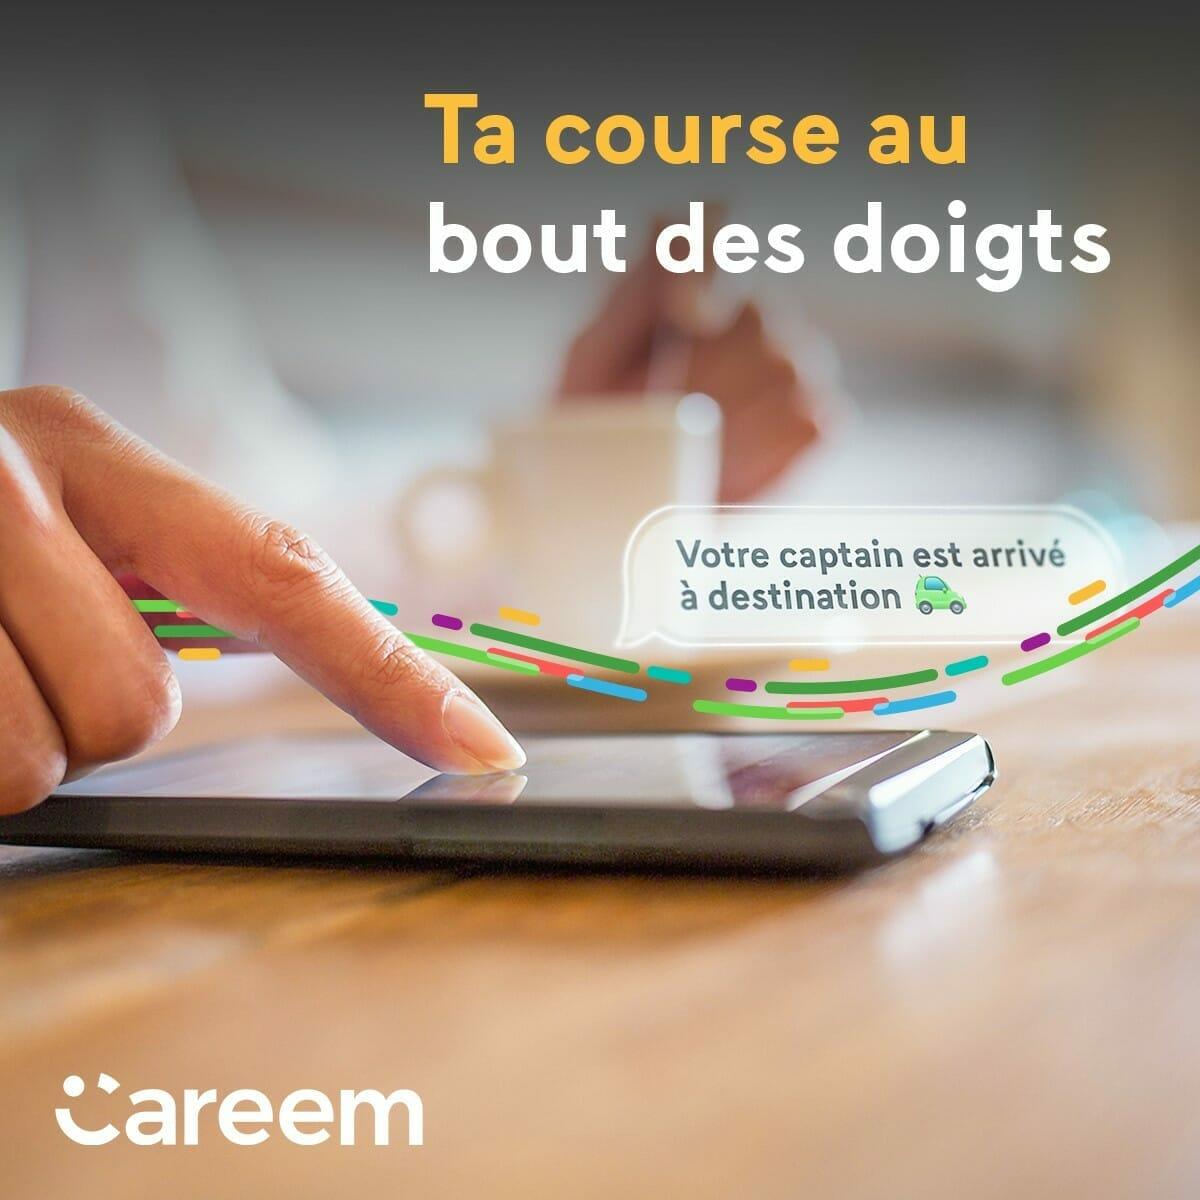 Careem-25